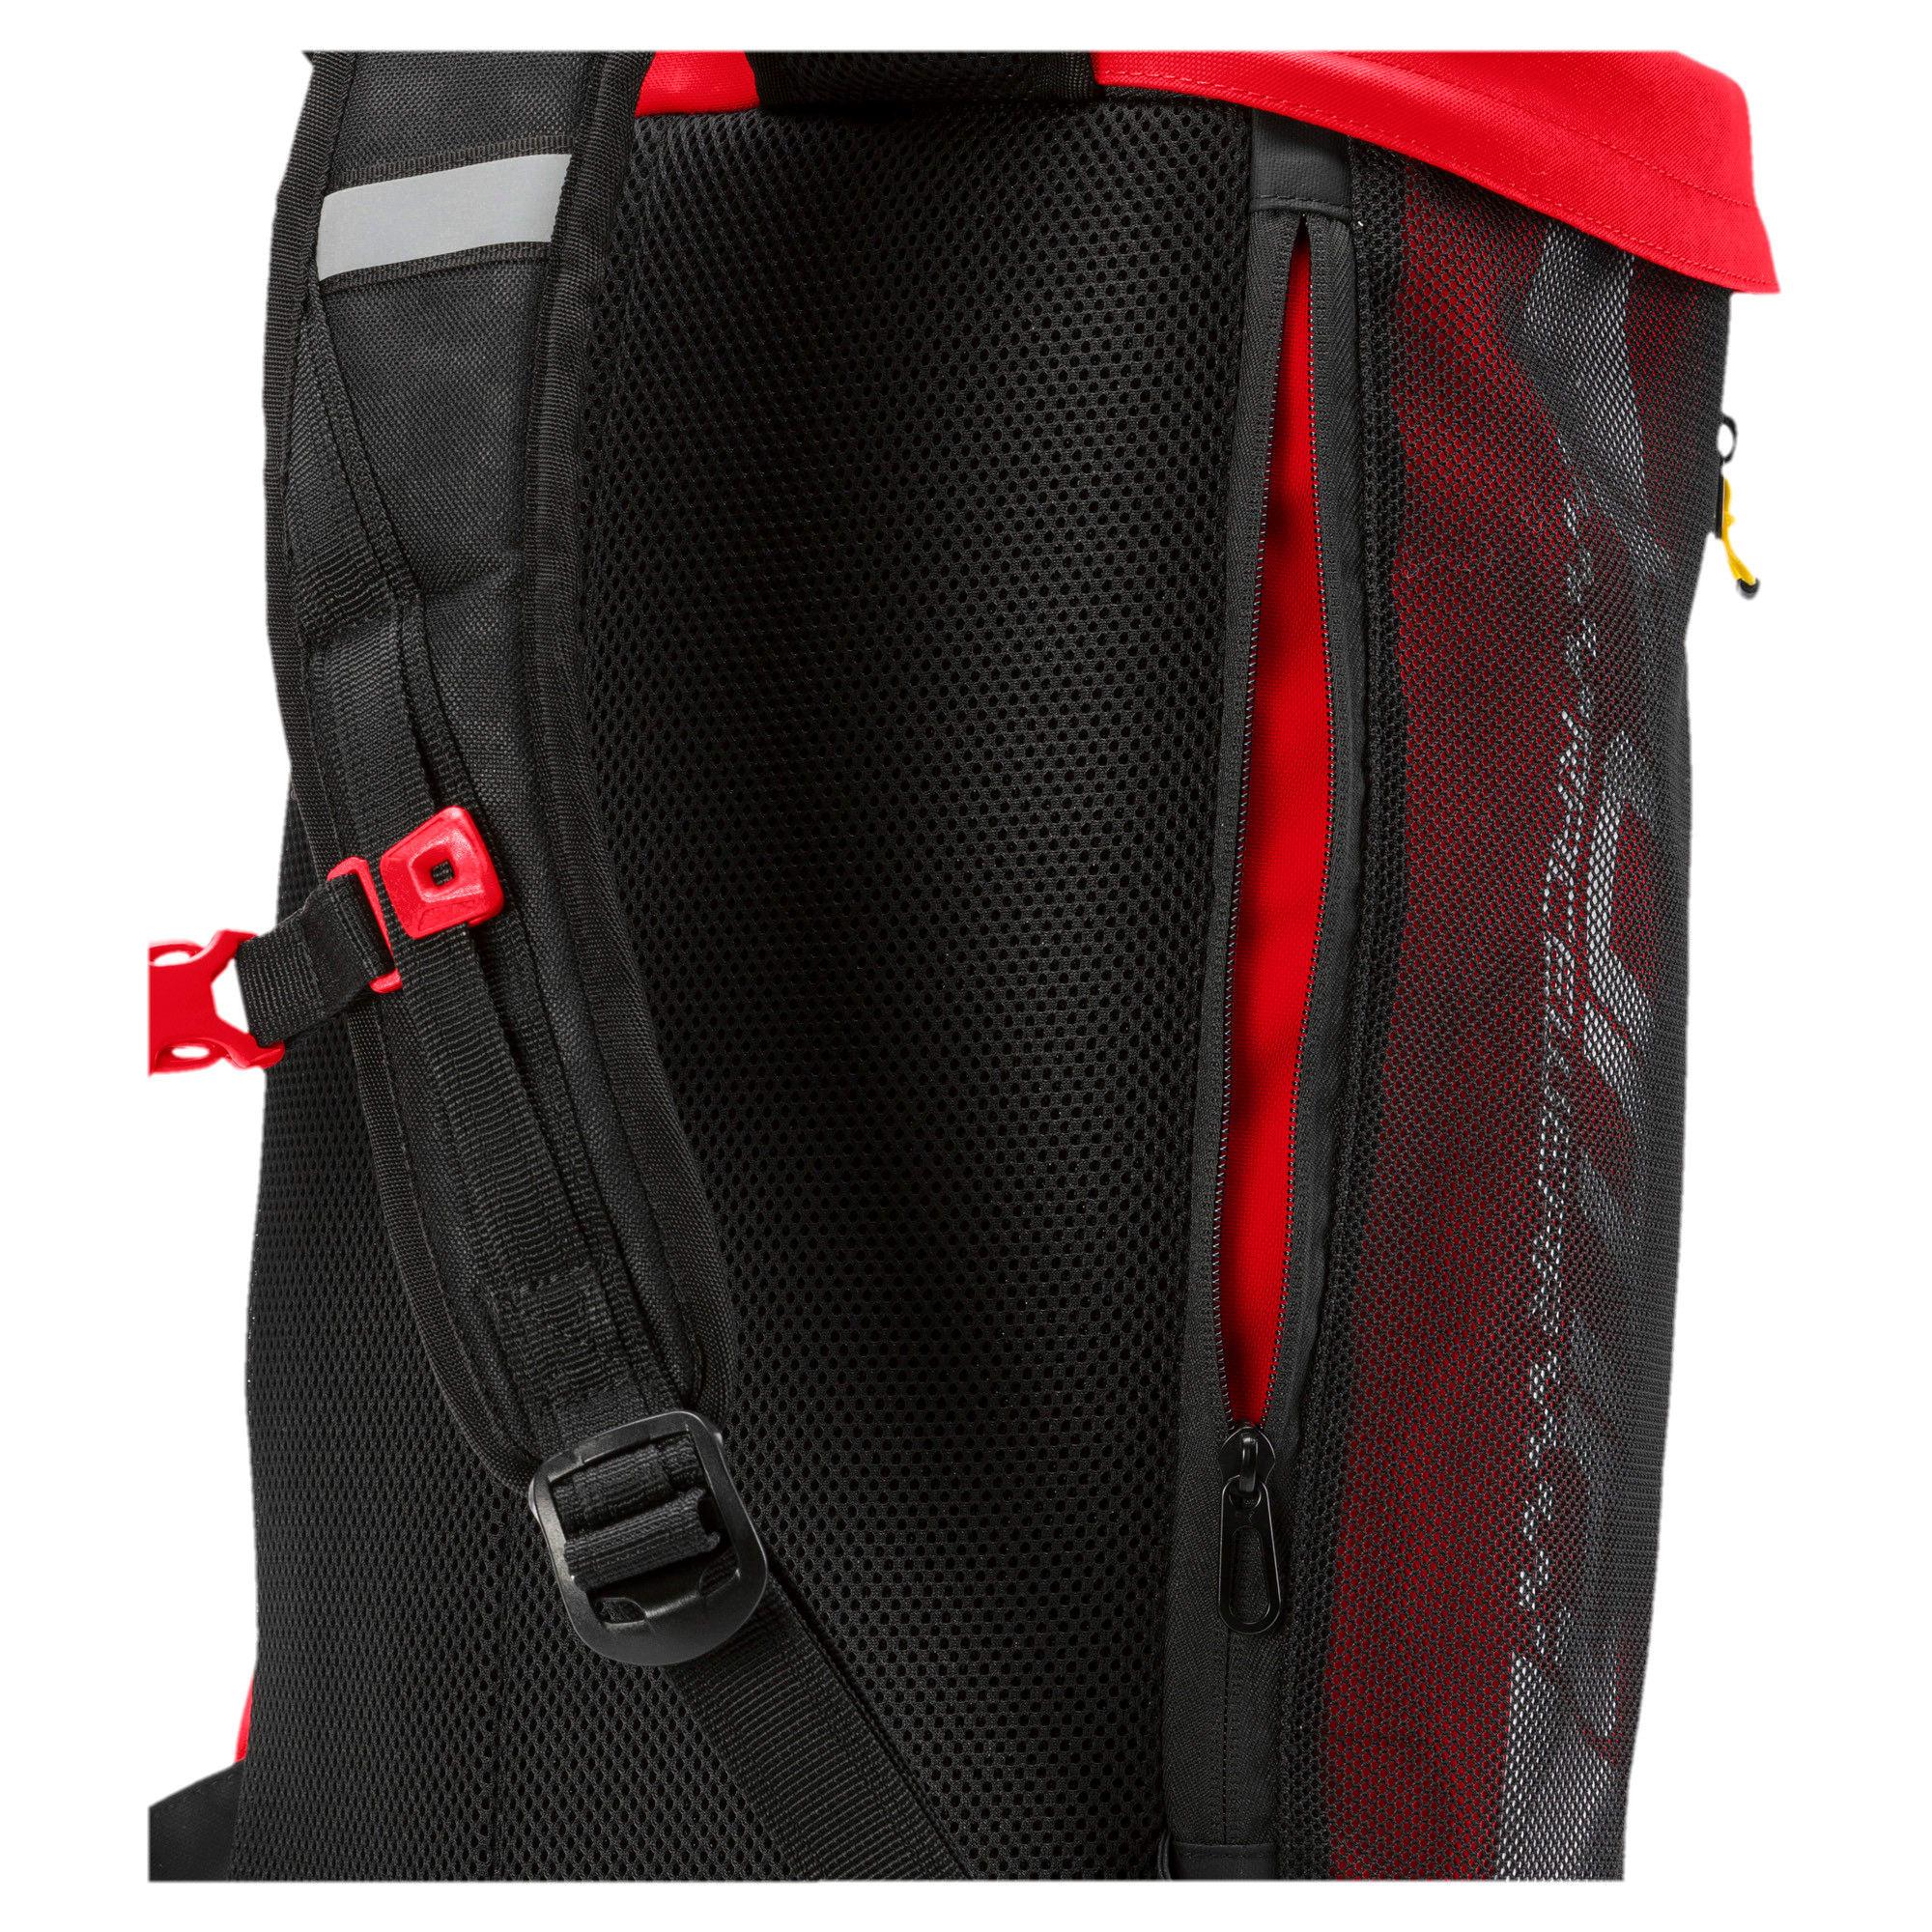 Thumbnail 3 of Ferrari Fanwear RCT Backpack, Rosso Corsa, medium-IND